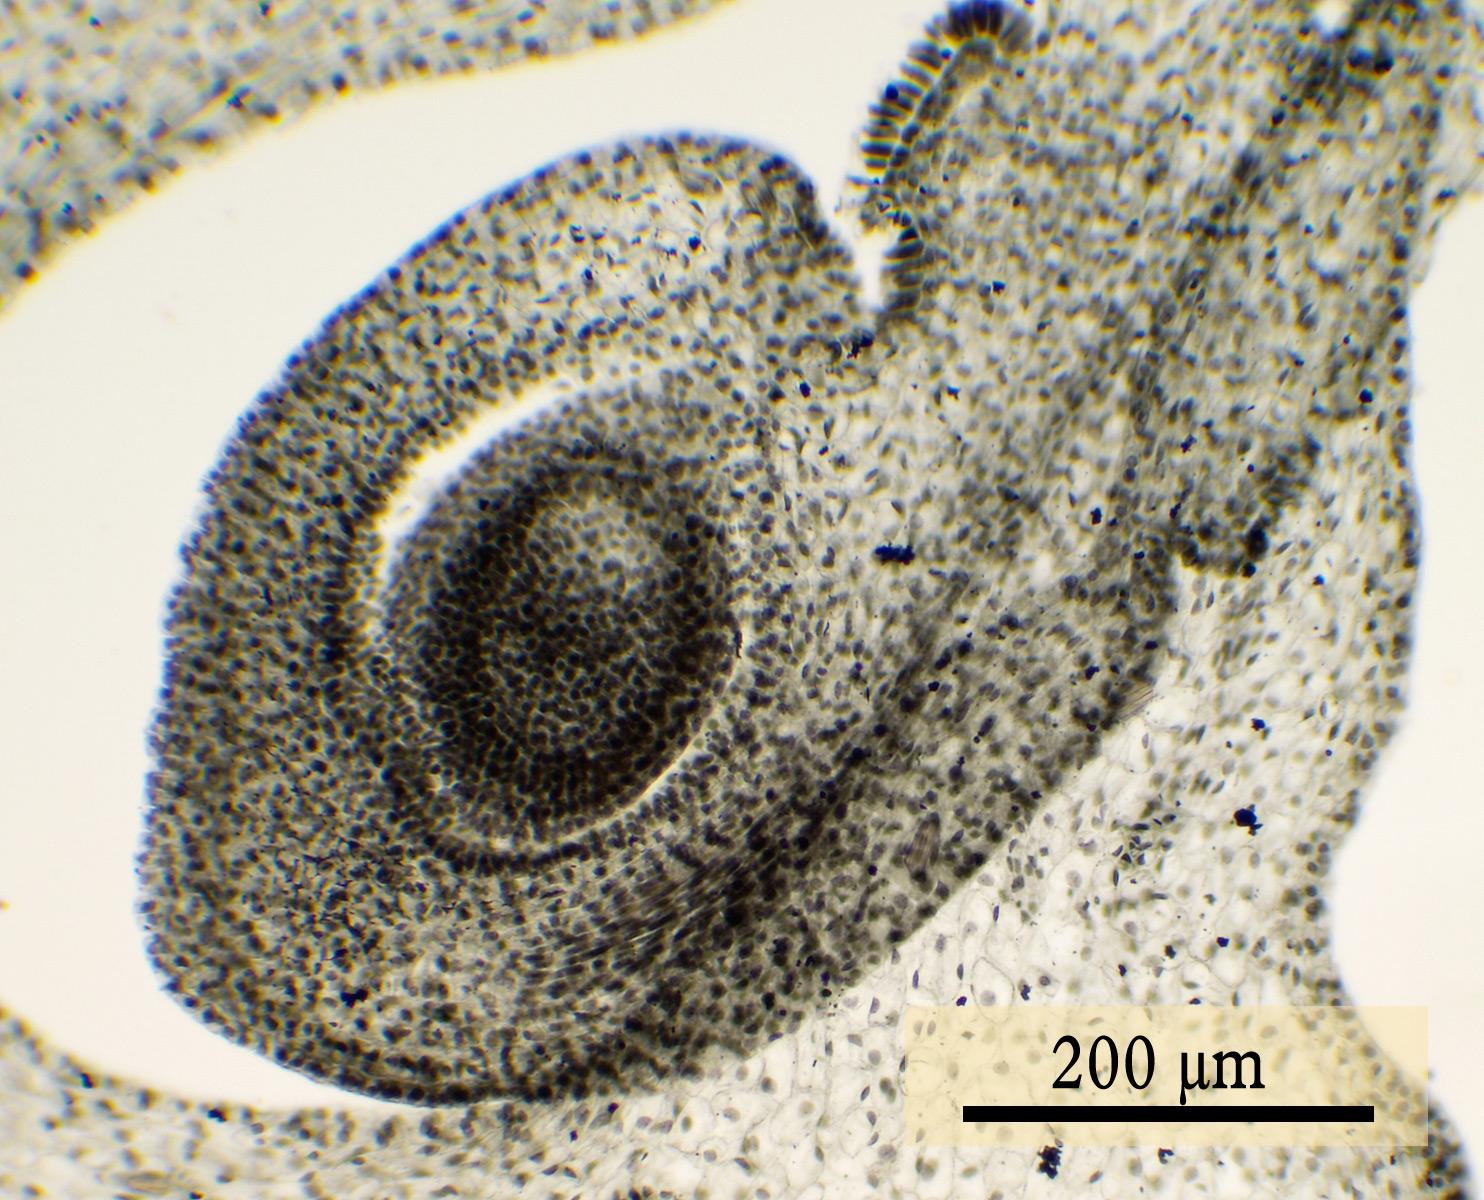 File:Ovulo 1 jpg - Wikimedia Commons